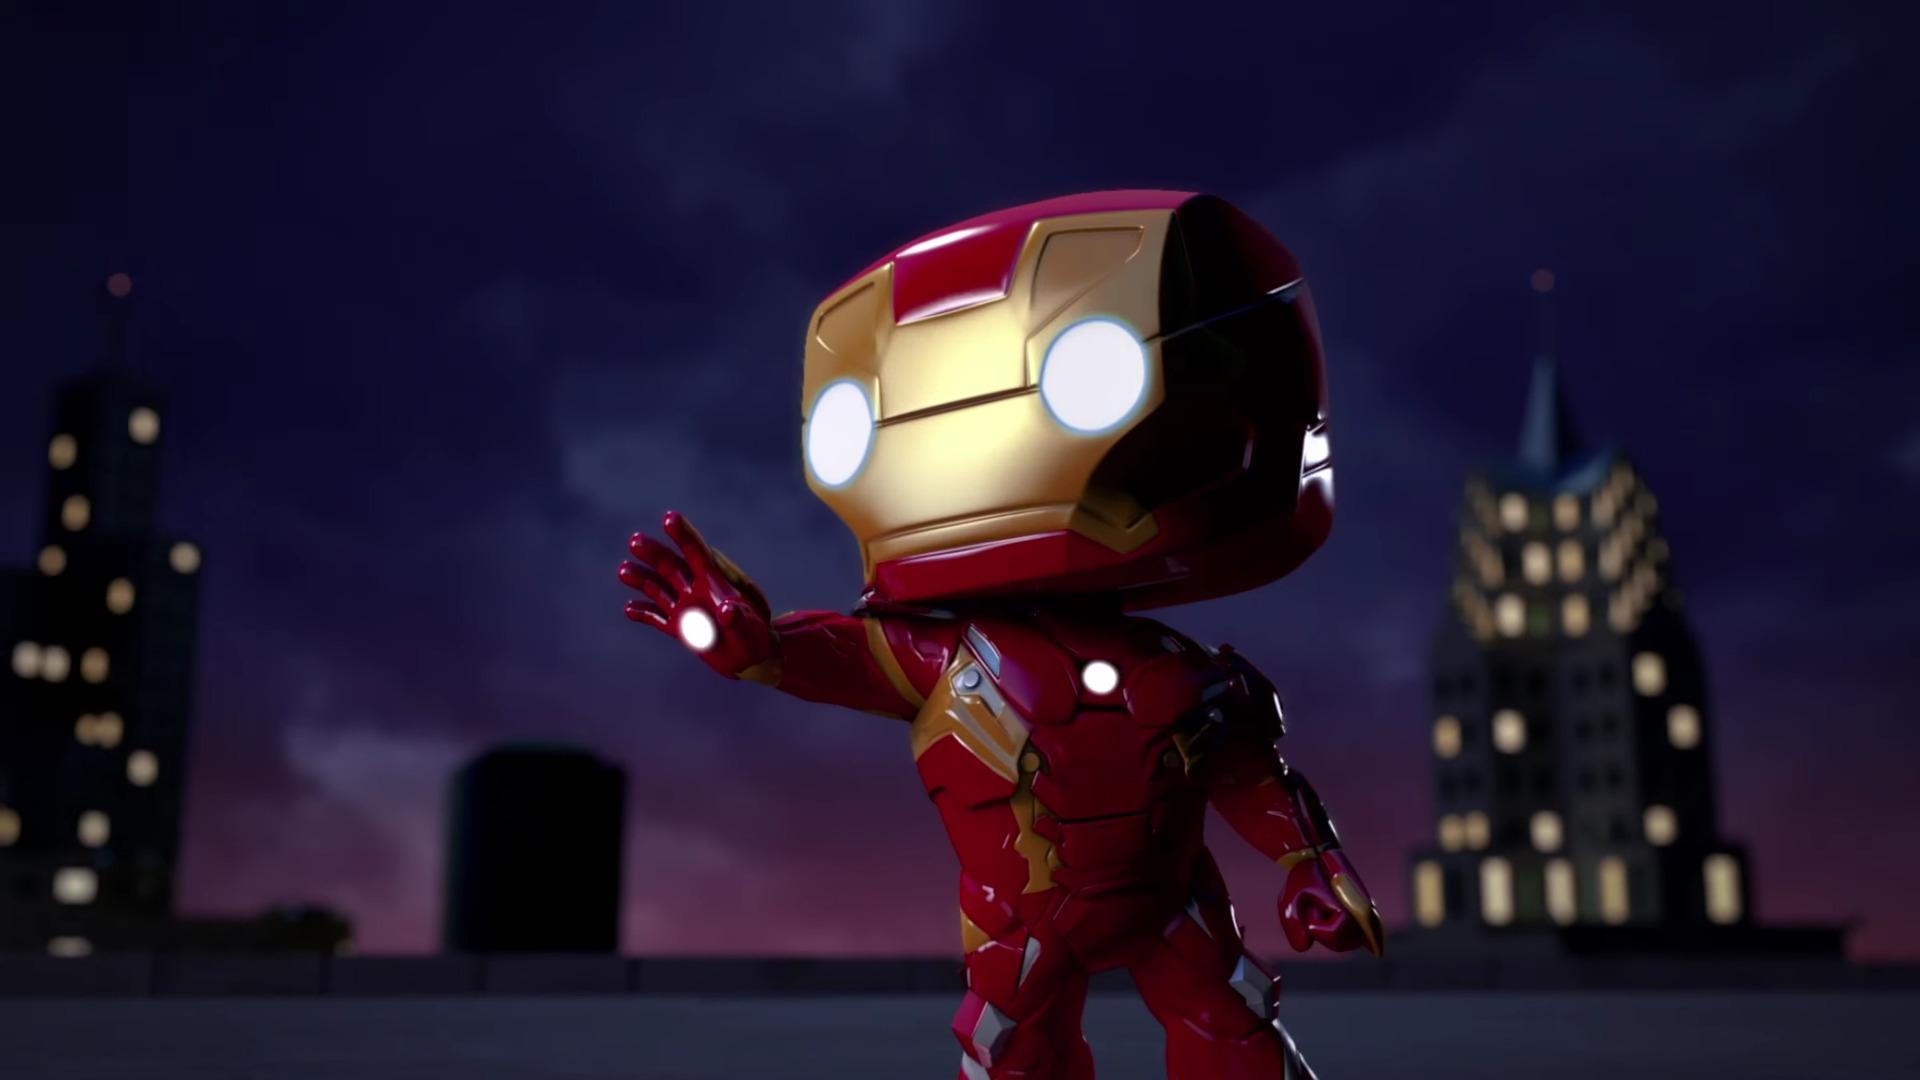 2048x2048 iron man spellbound animated movie ipad air hd - Iron man cartoon download ...